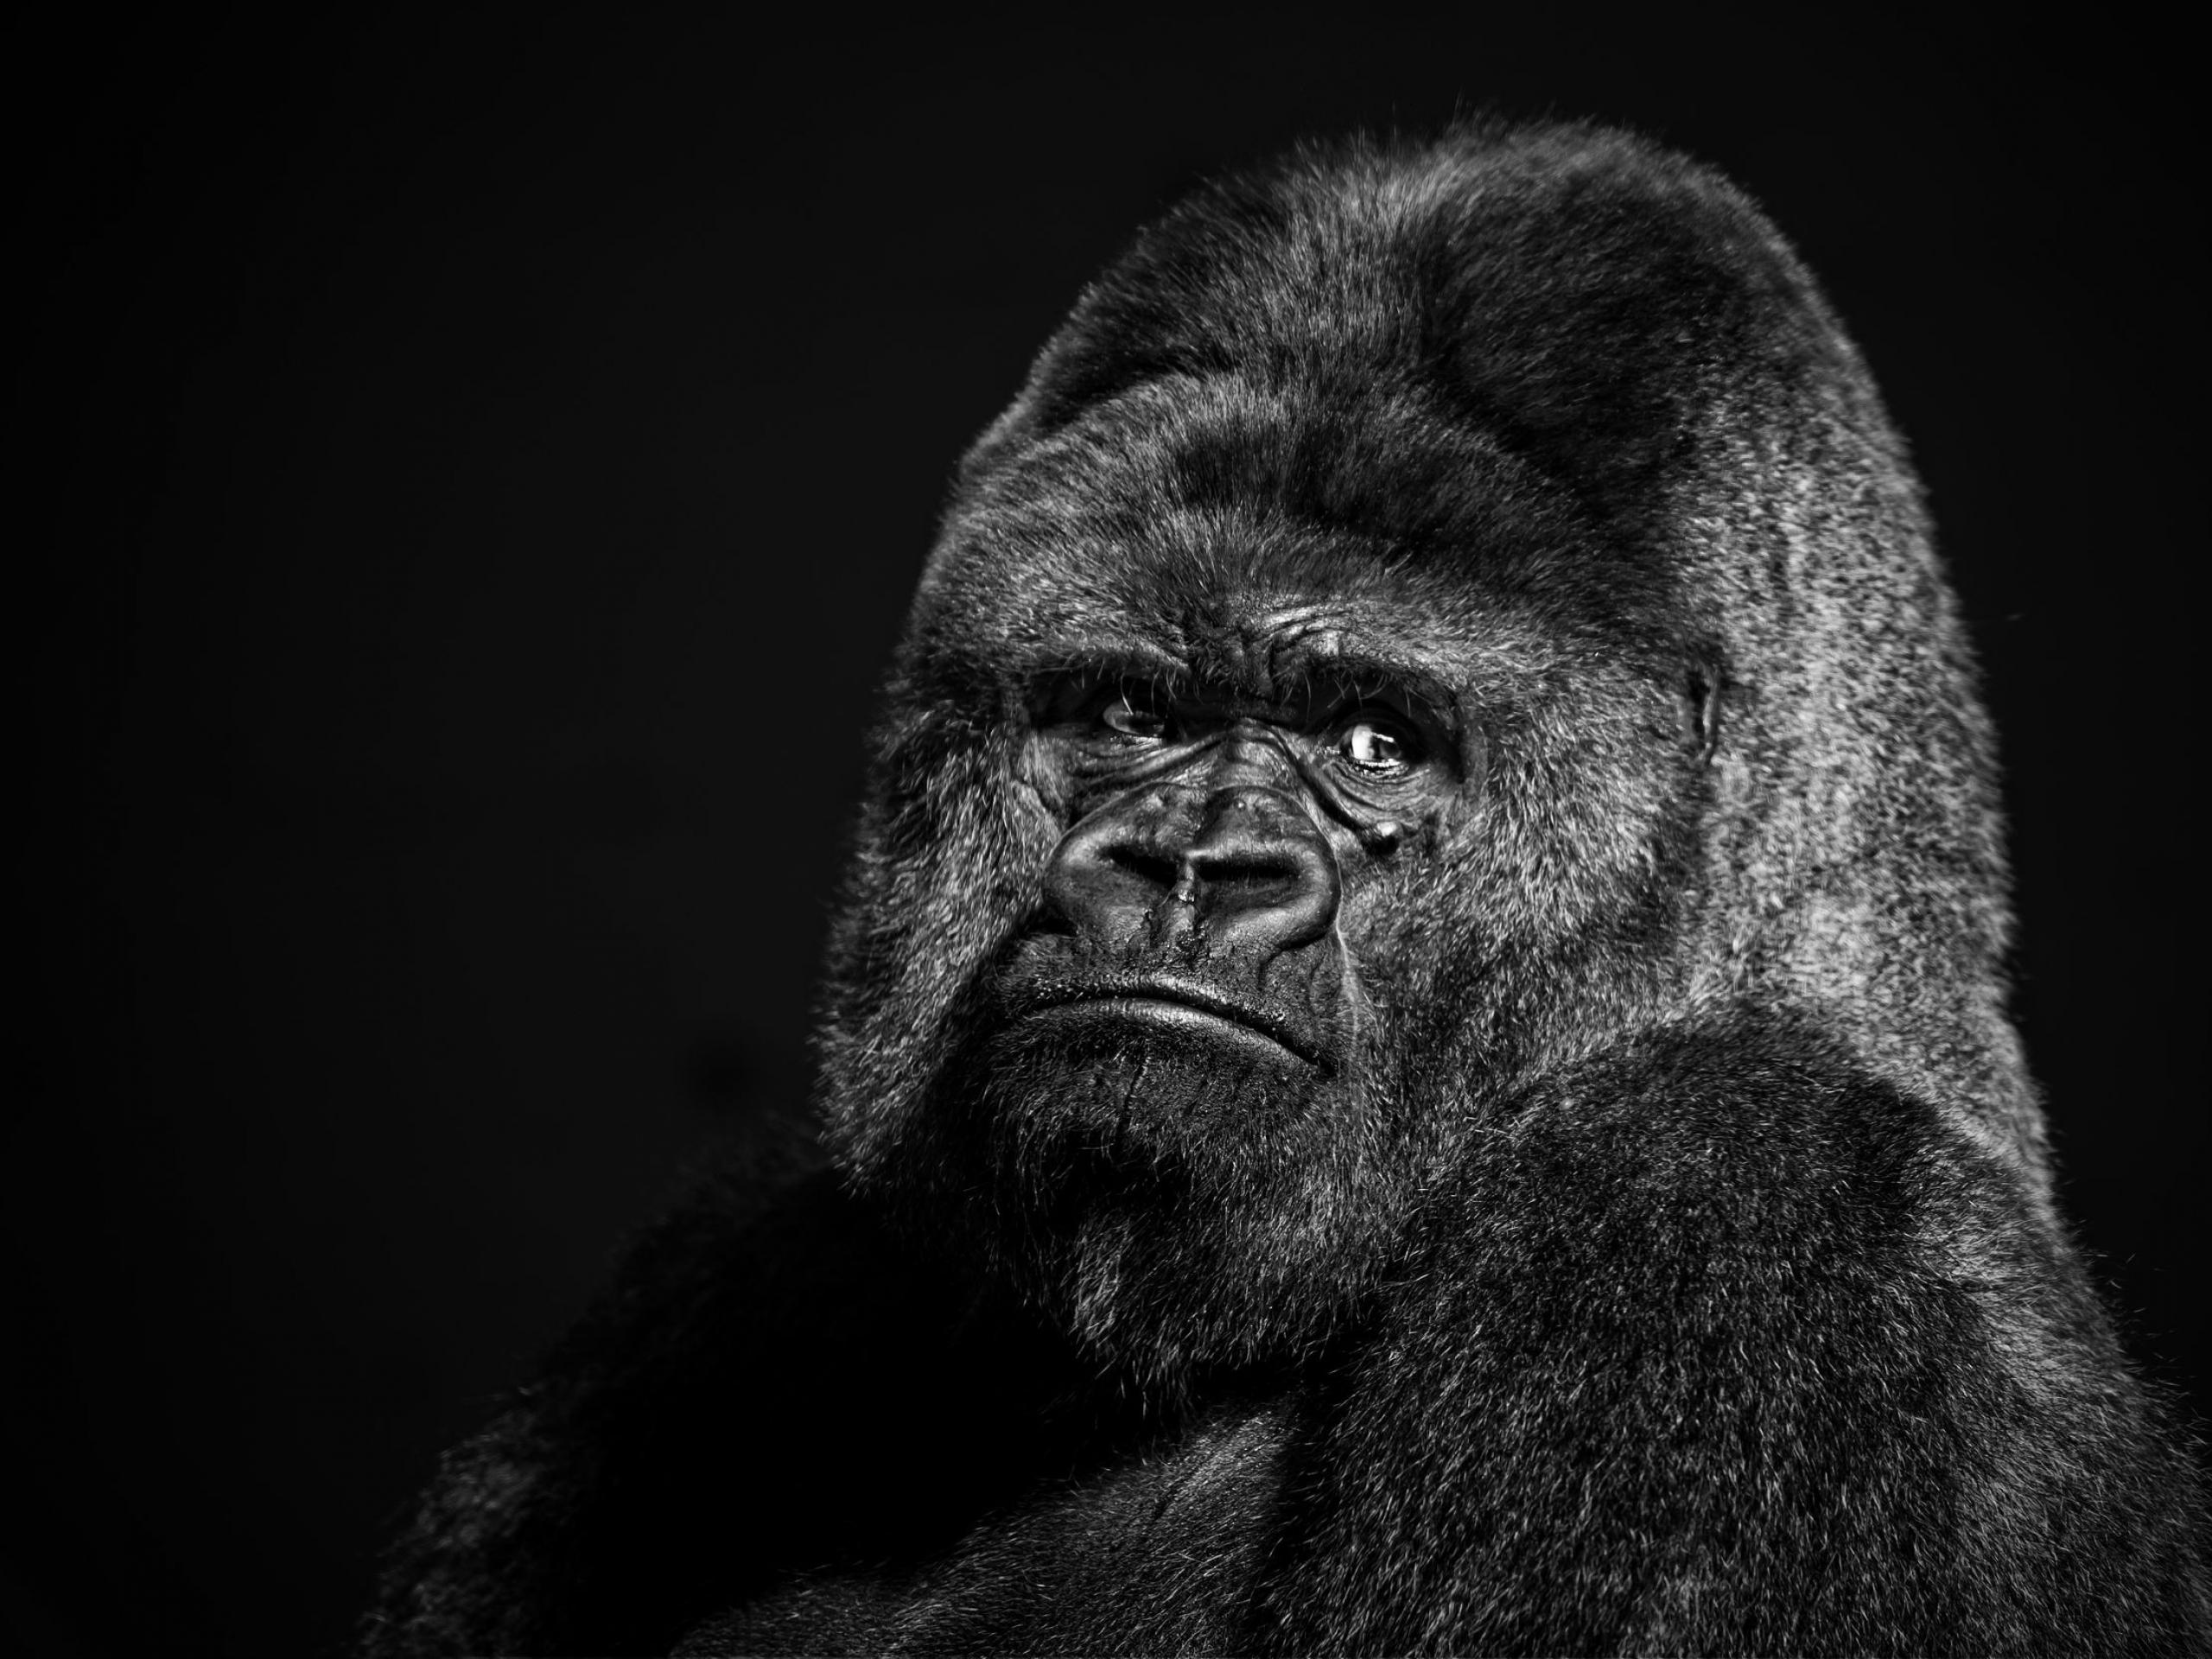 13 Excellent HD Gorilla Wallpapers   HDWallSourcecom 2560x1920